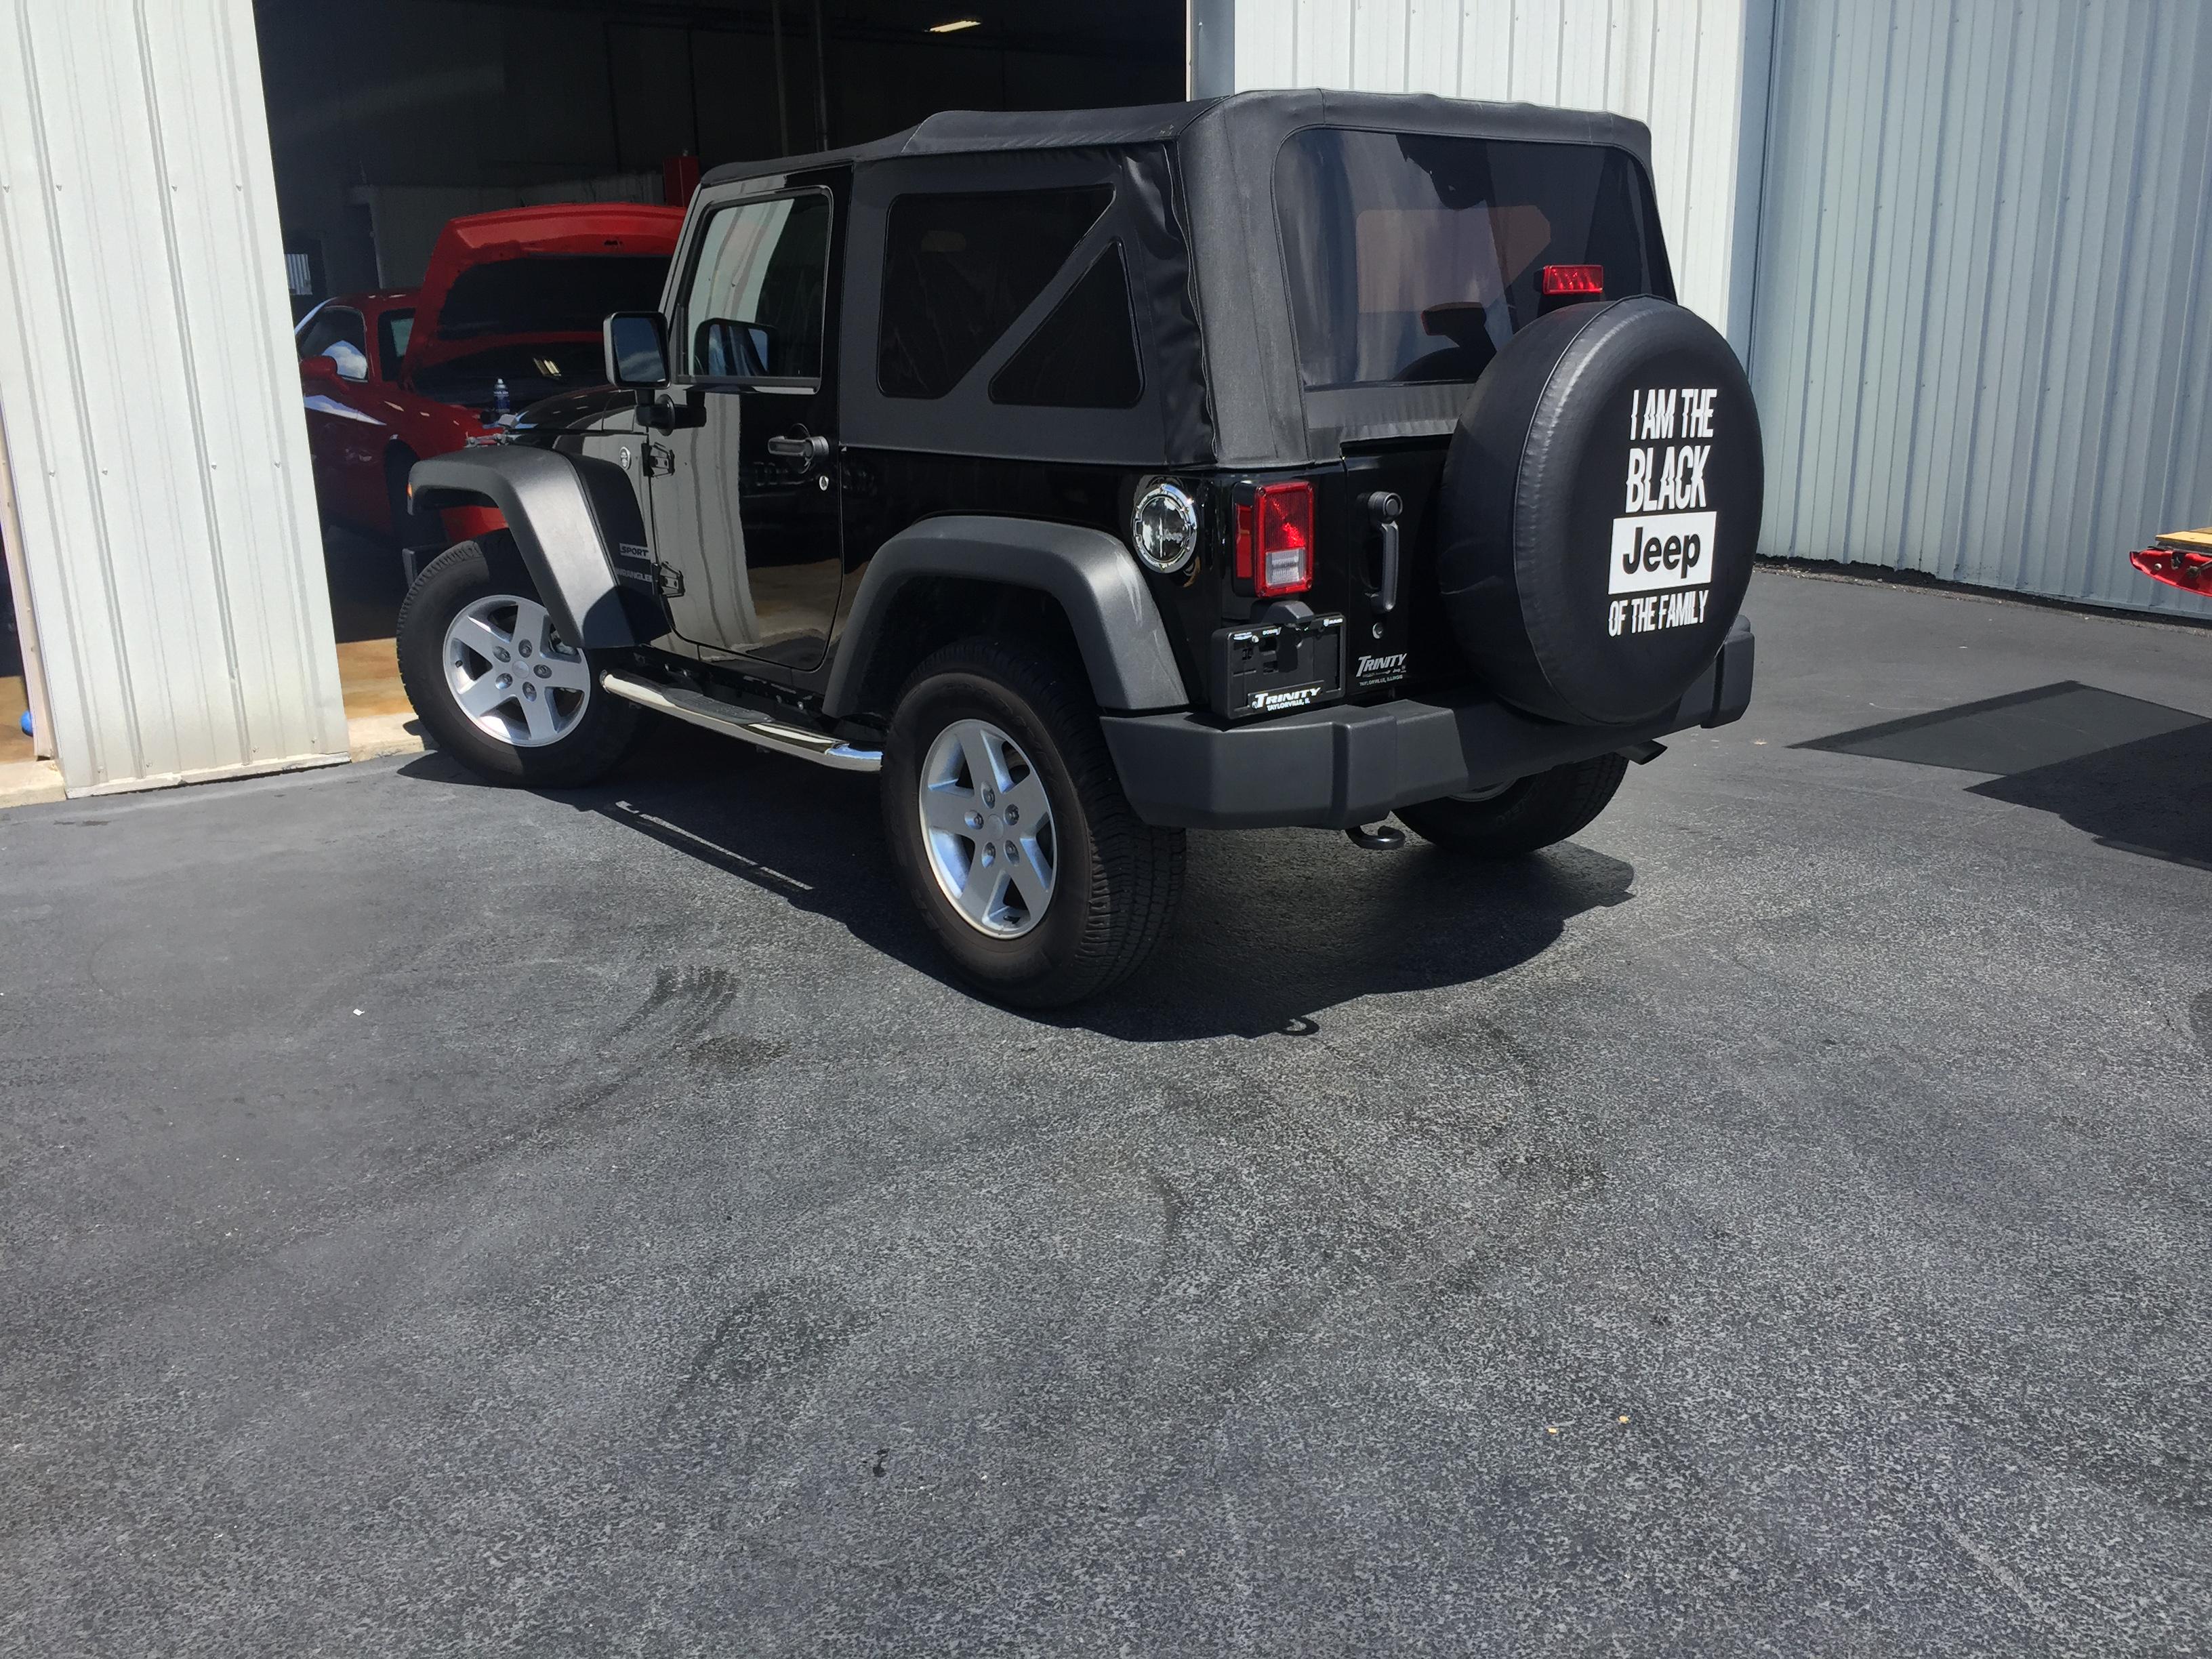 2015 Jeep Wrangler Dent Repair, Springfield, IL, http://217dent.com